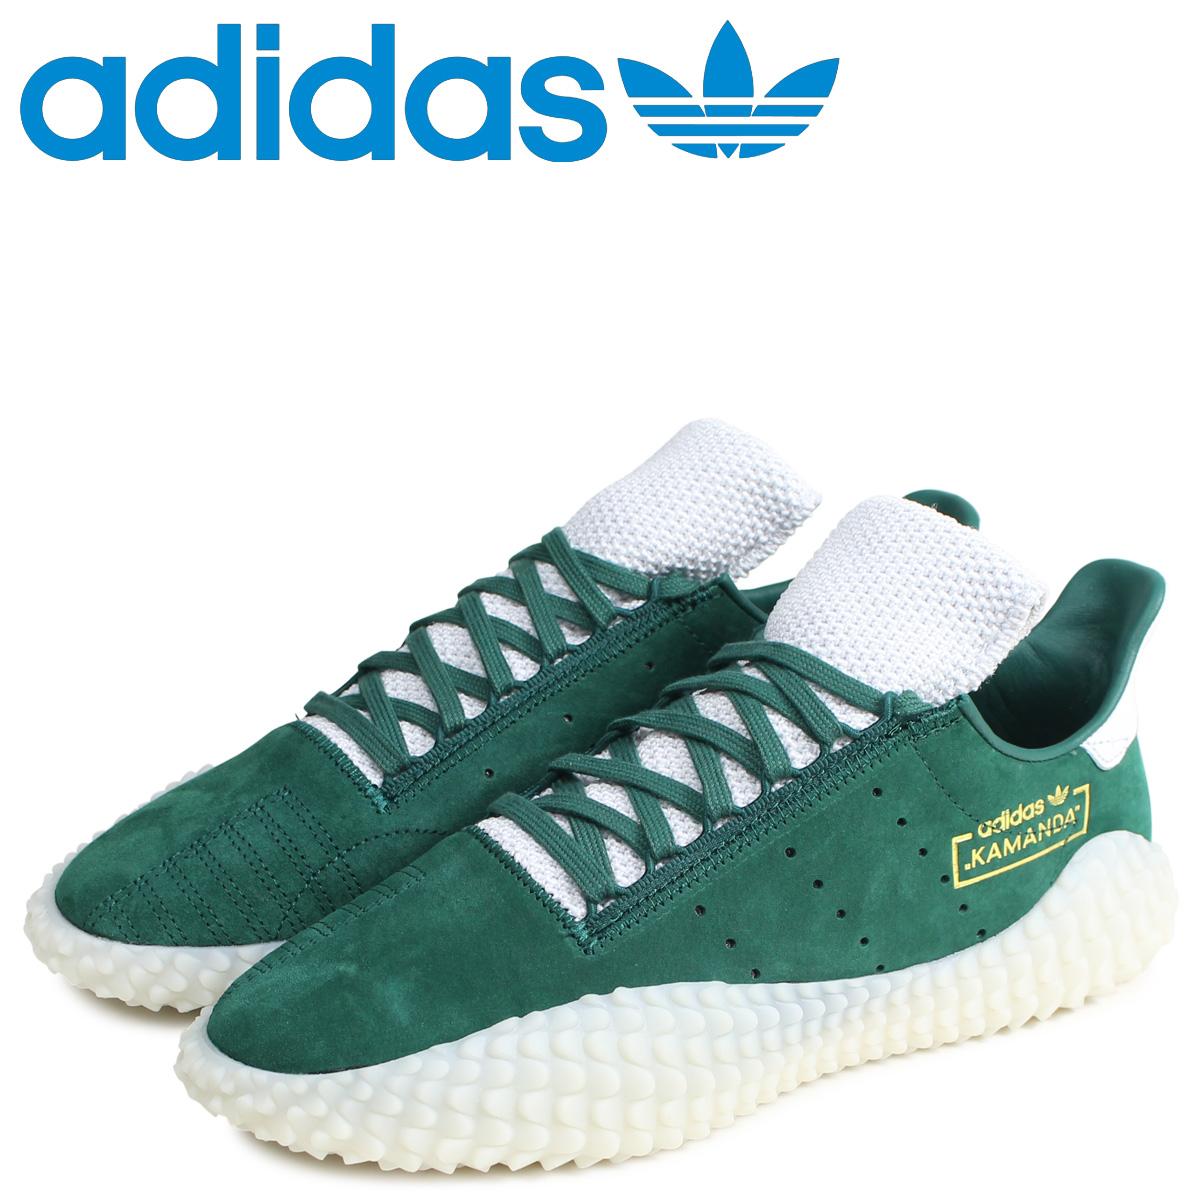 adidas Originals アディダス オリジナルス カマンダ スニーカー メンズ KAMANDA グリーン G27713